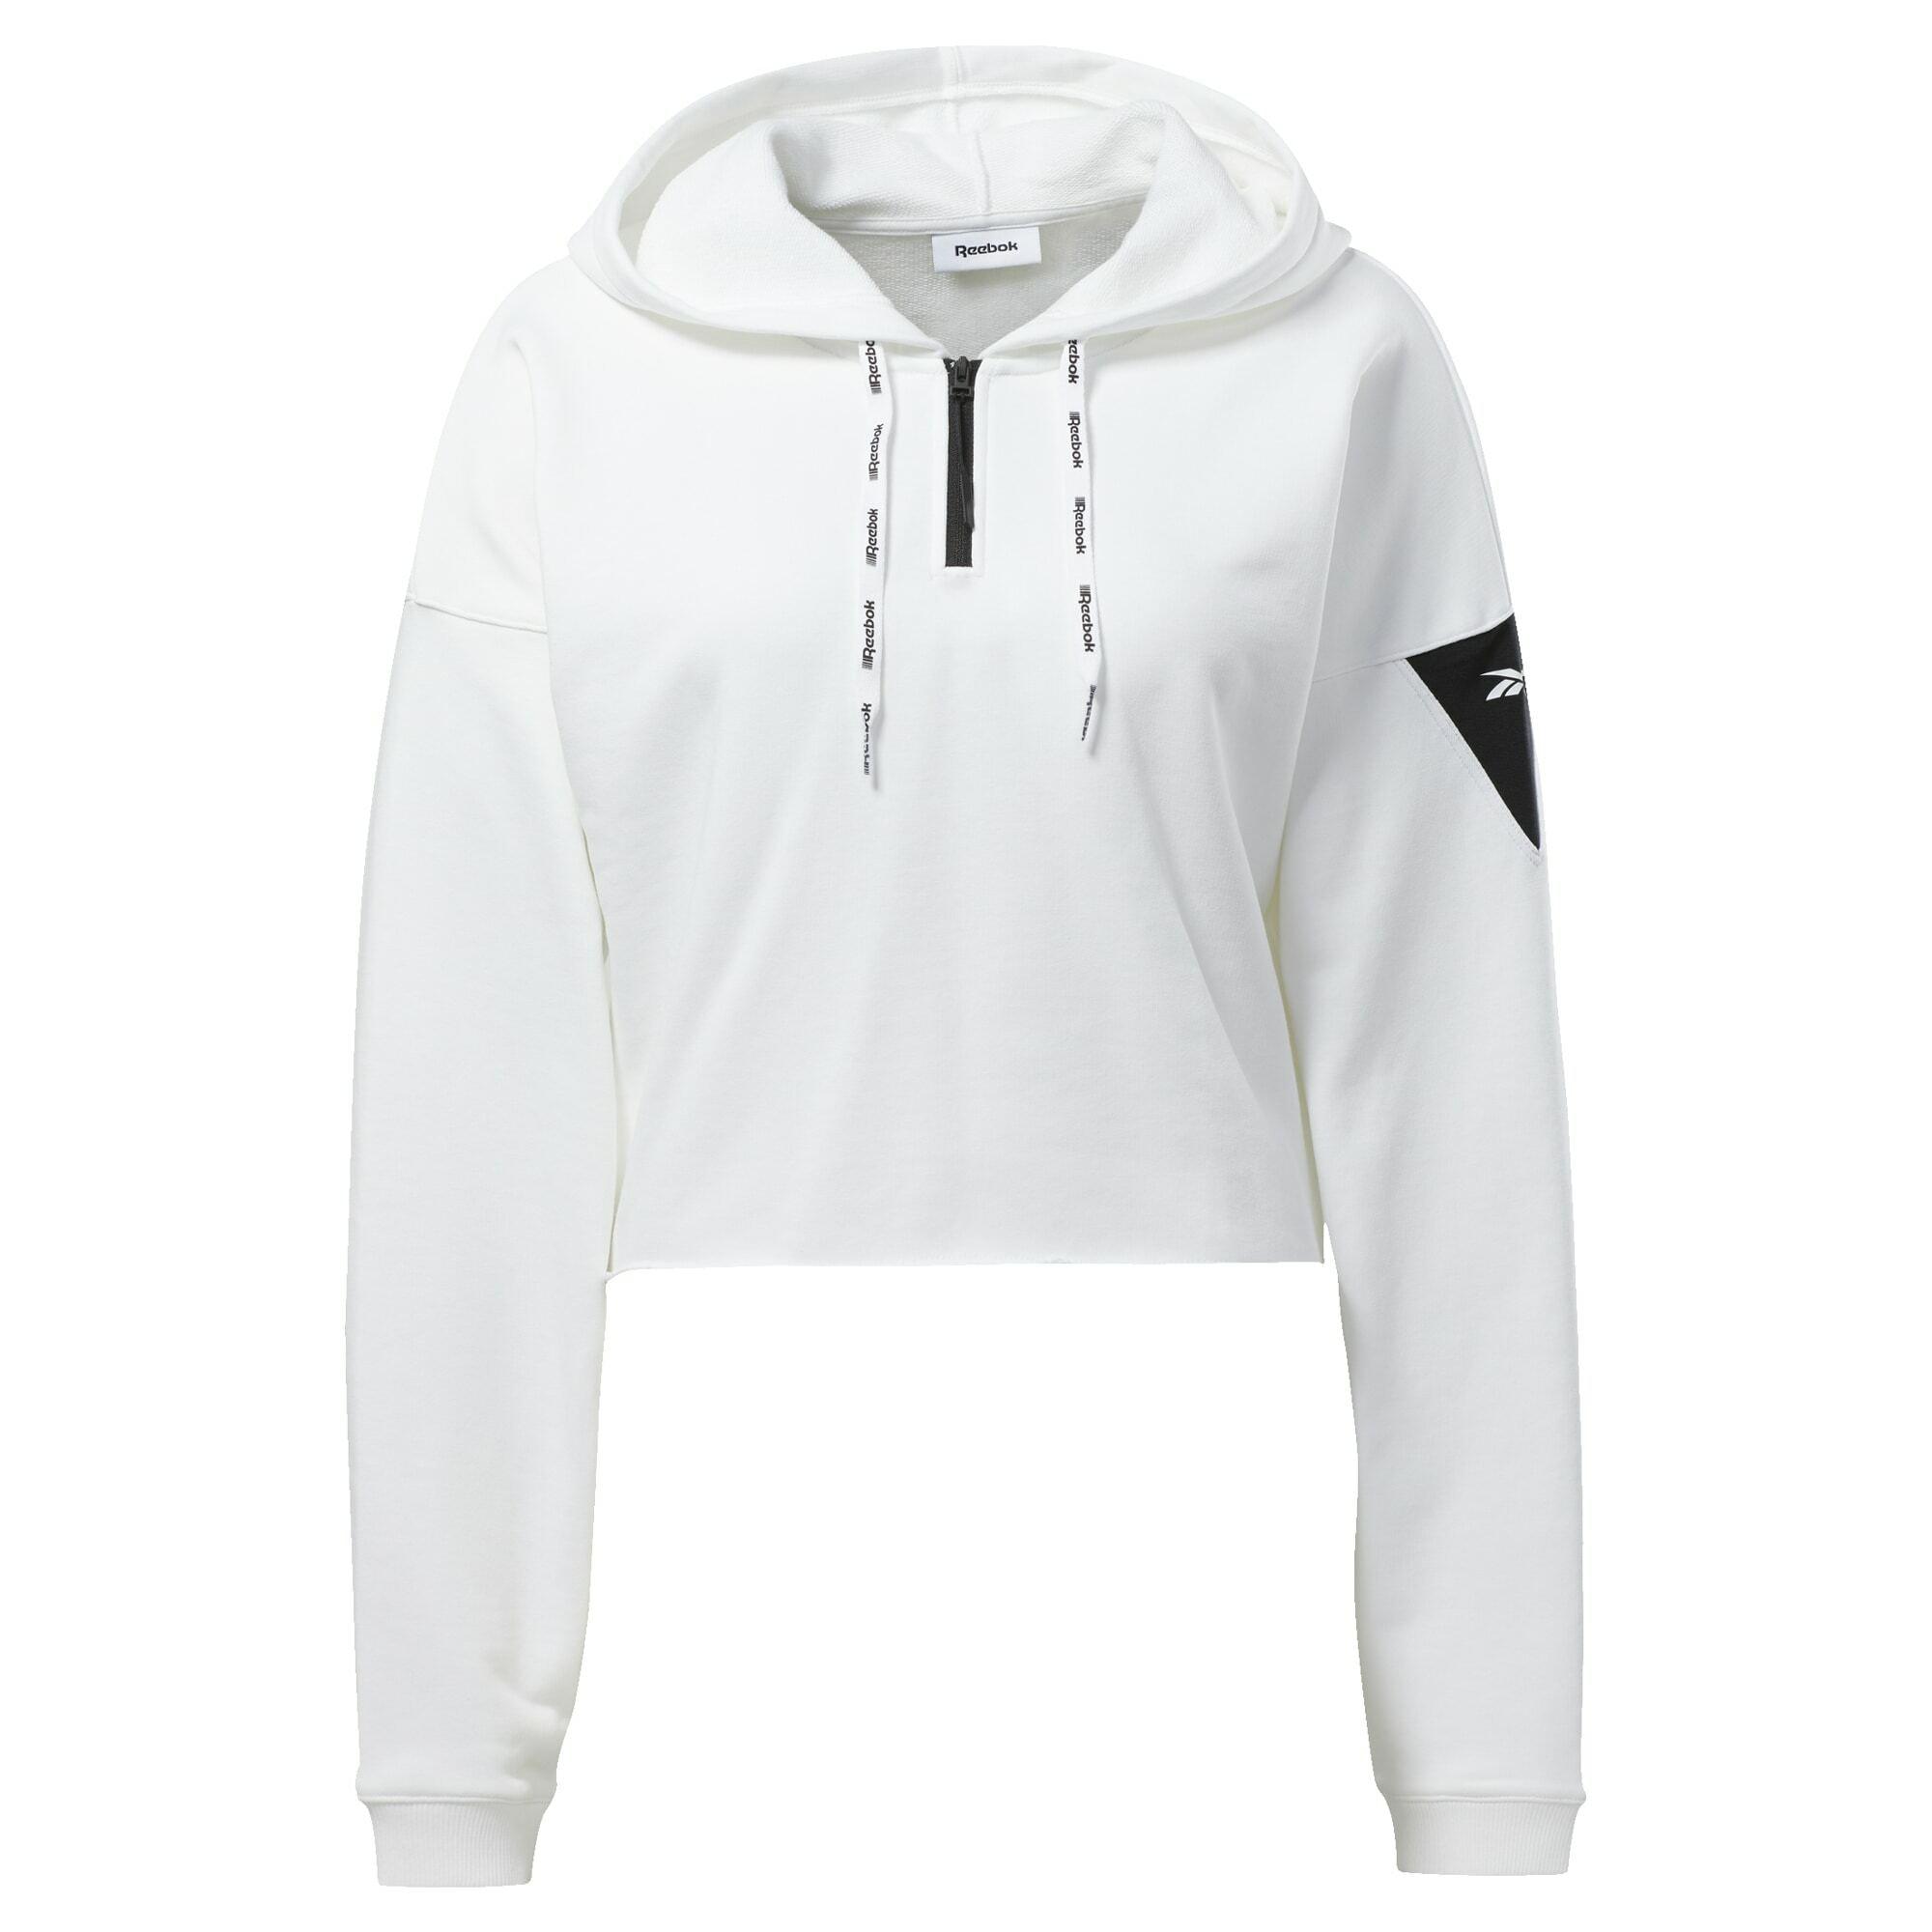 REEBOK Sportinio tipo megztinis juoda / balta